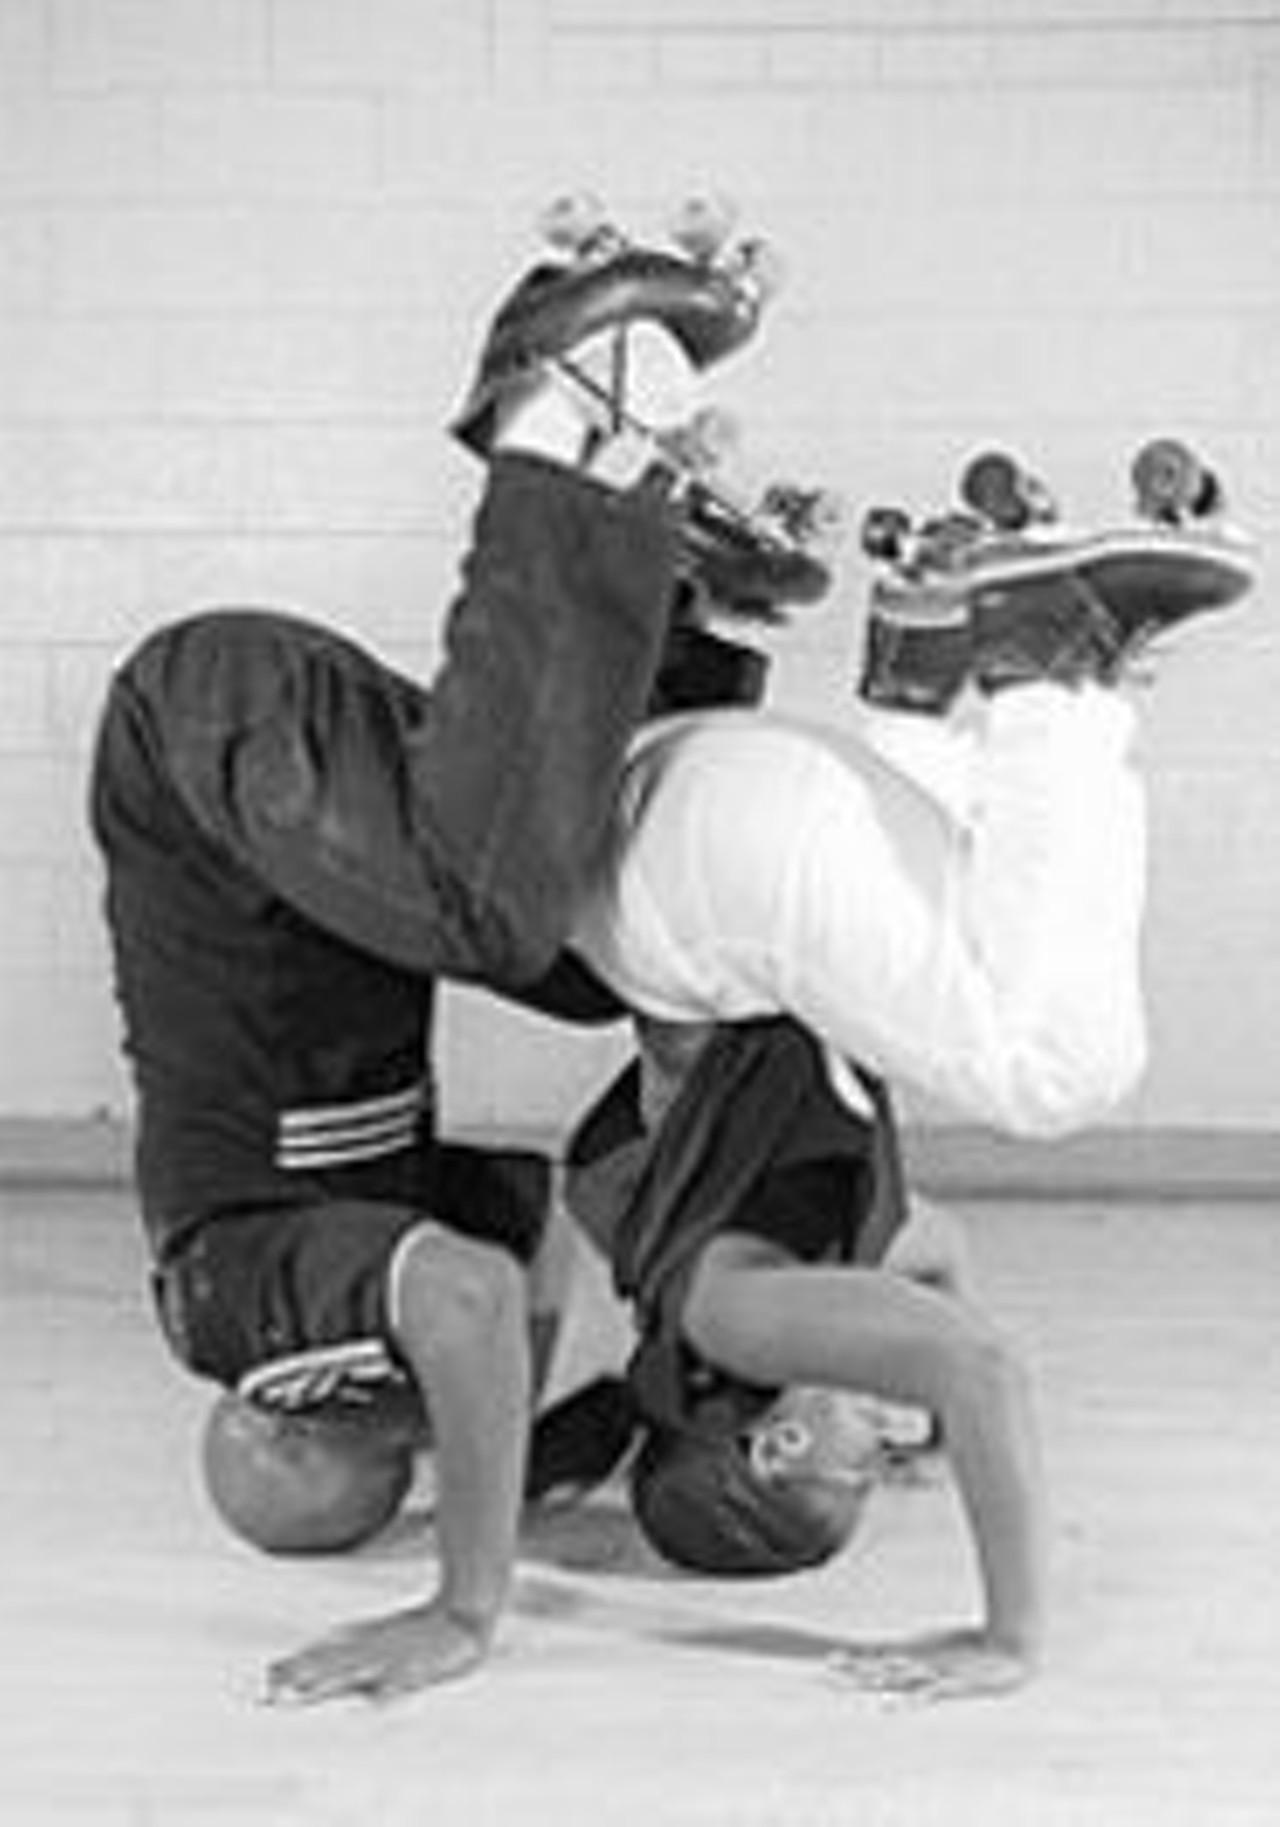 Roller skating rink lafayette in -  Go Ahead